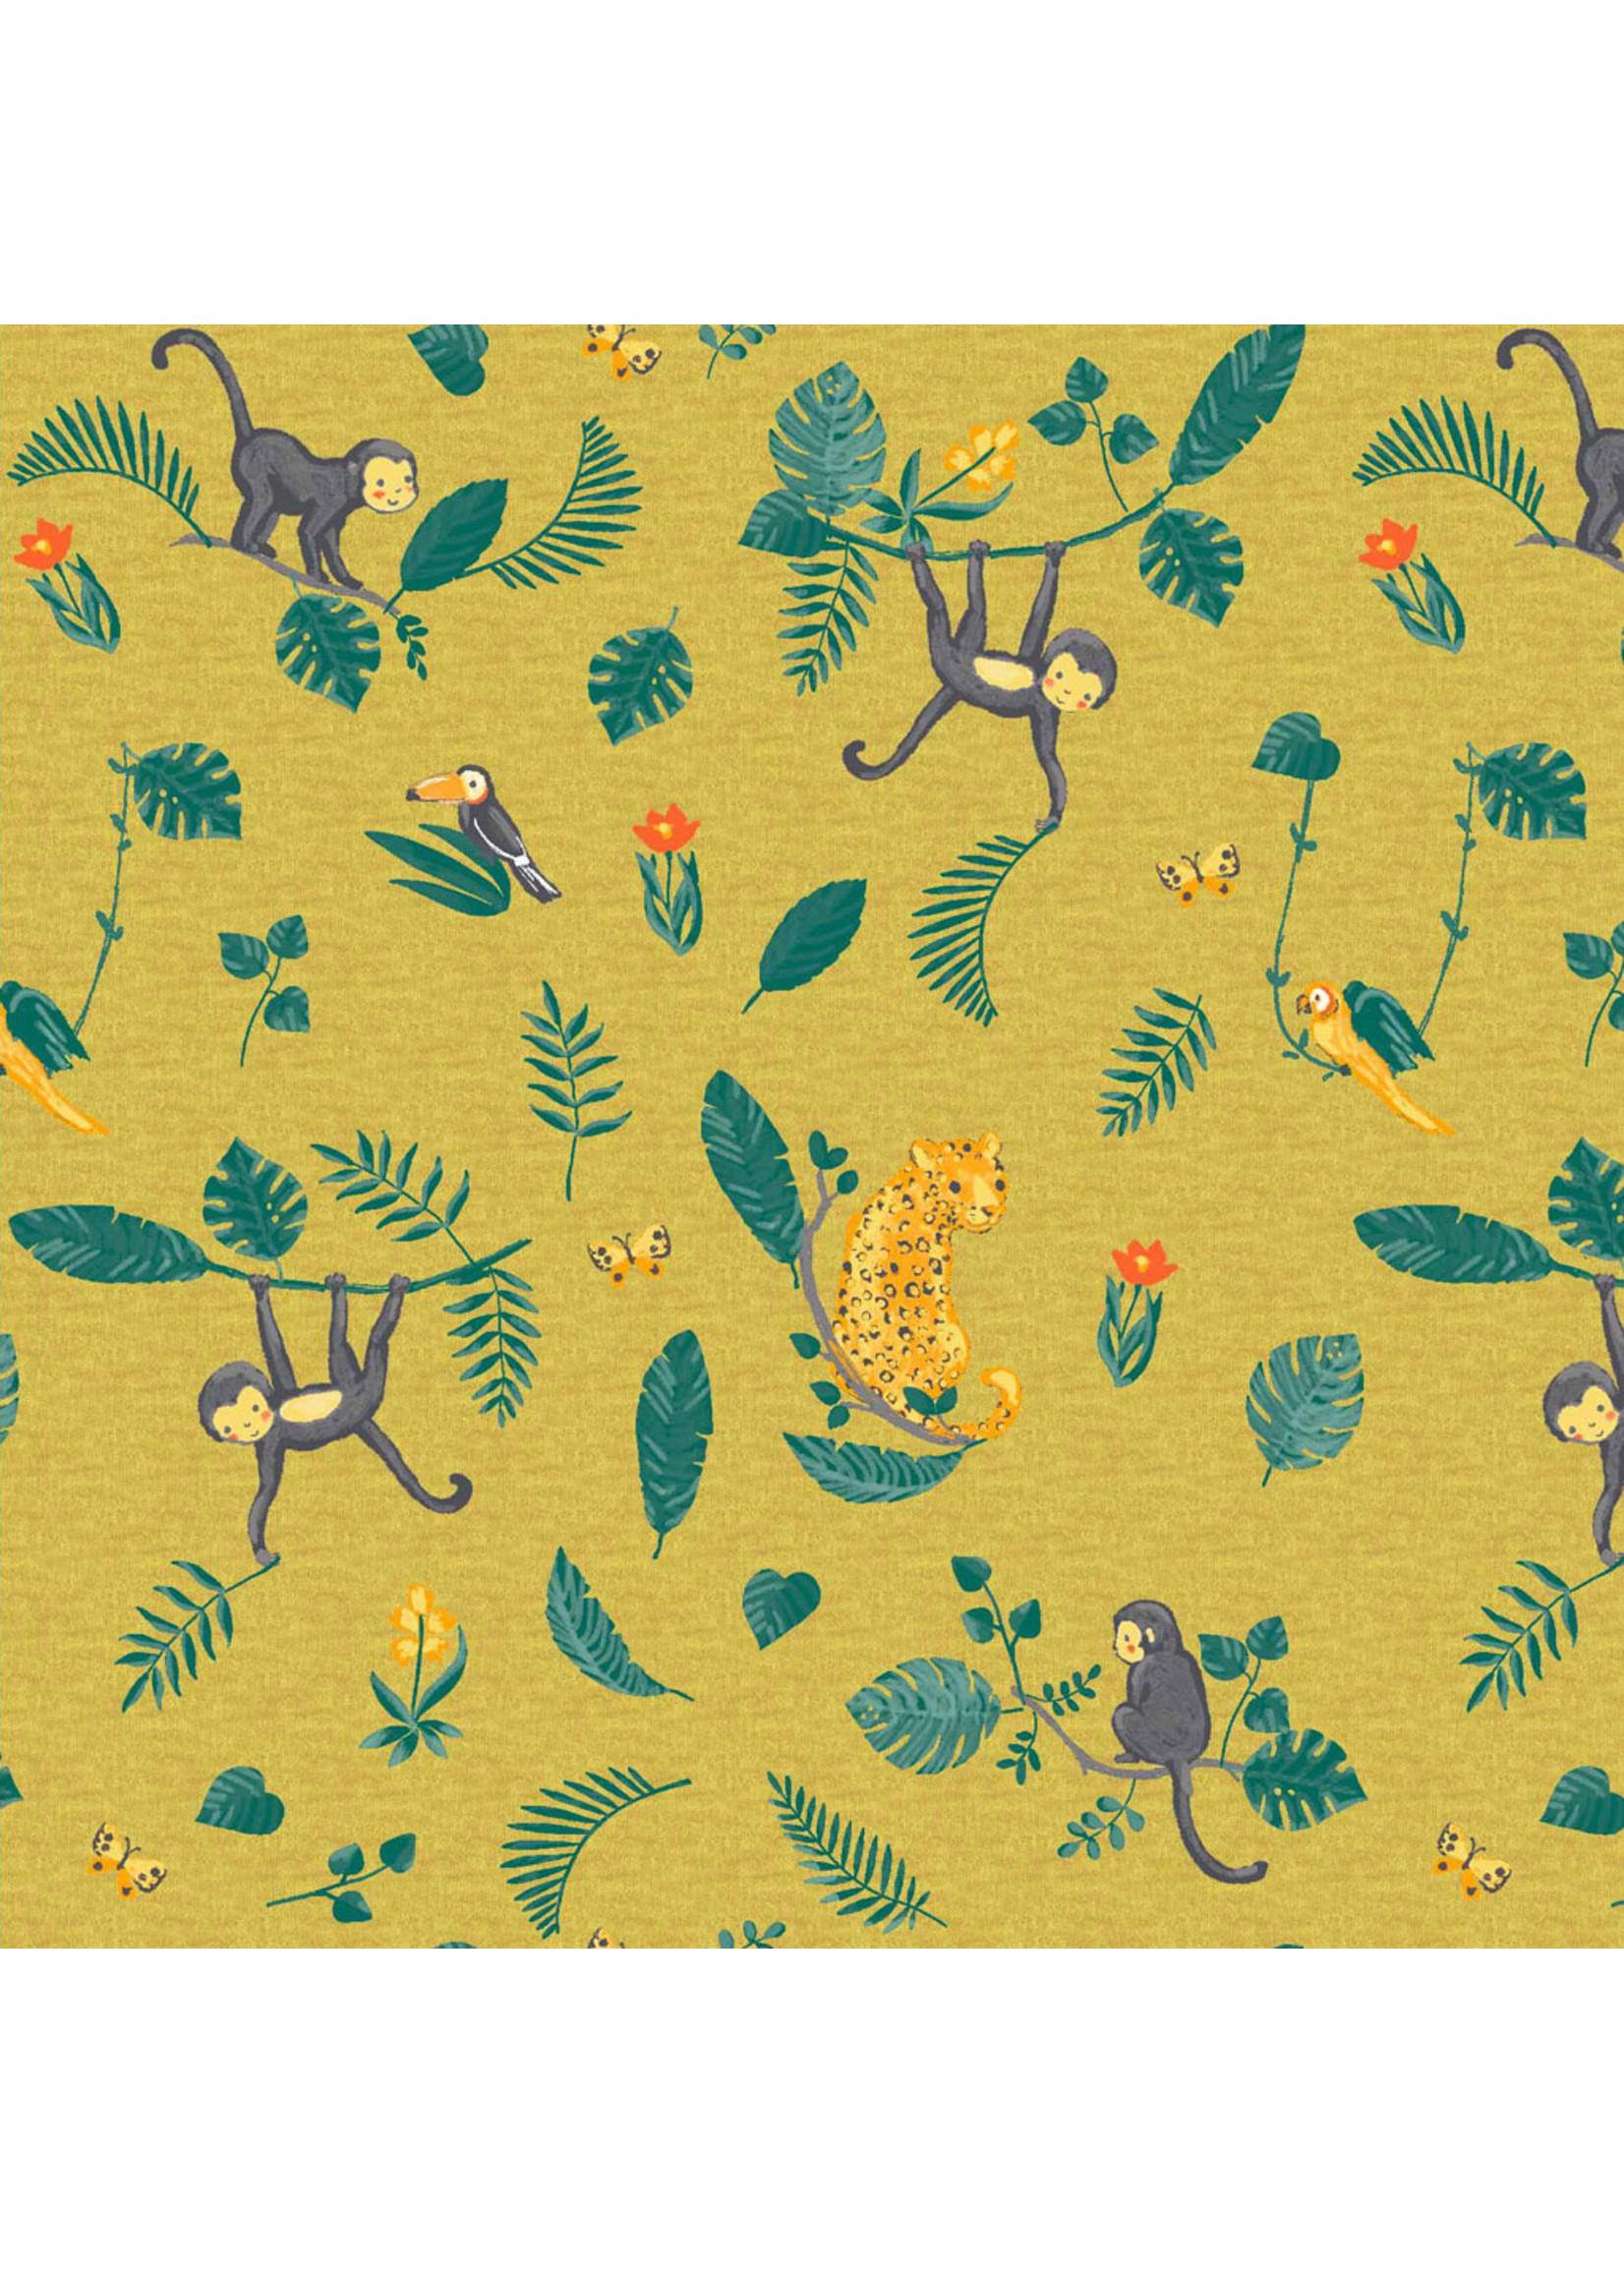 Designed for you by Poppy Jersey GOTS Digital Swinging Monkeys